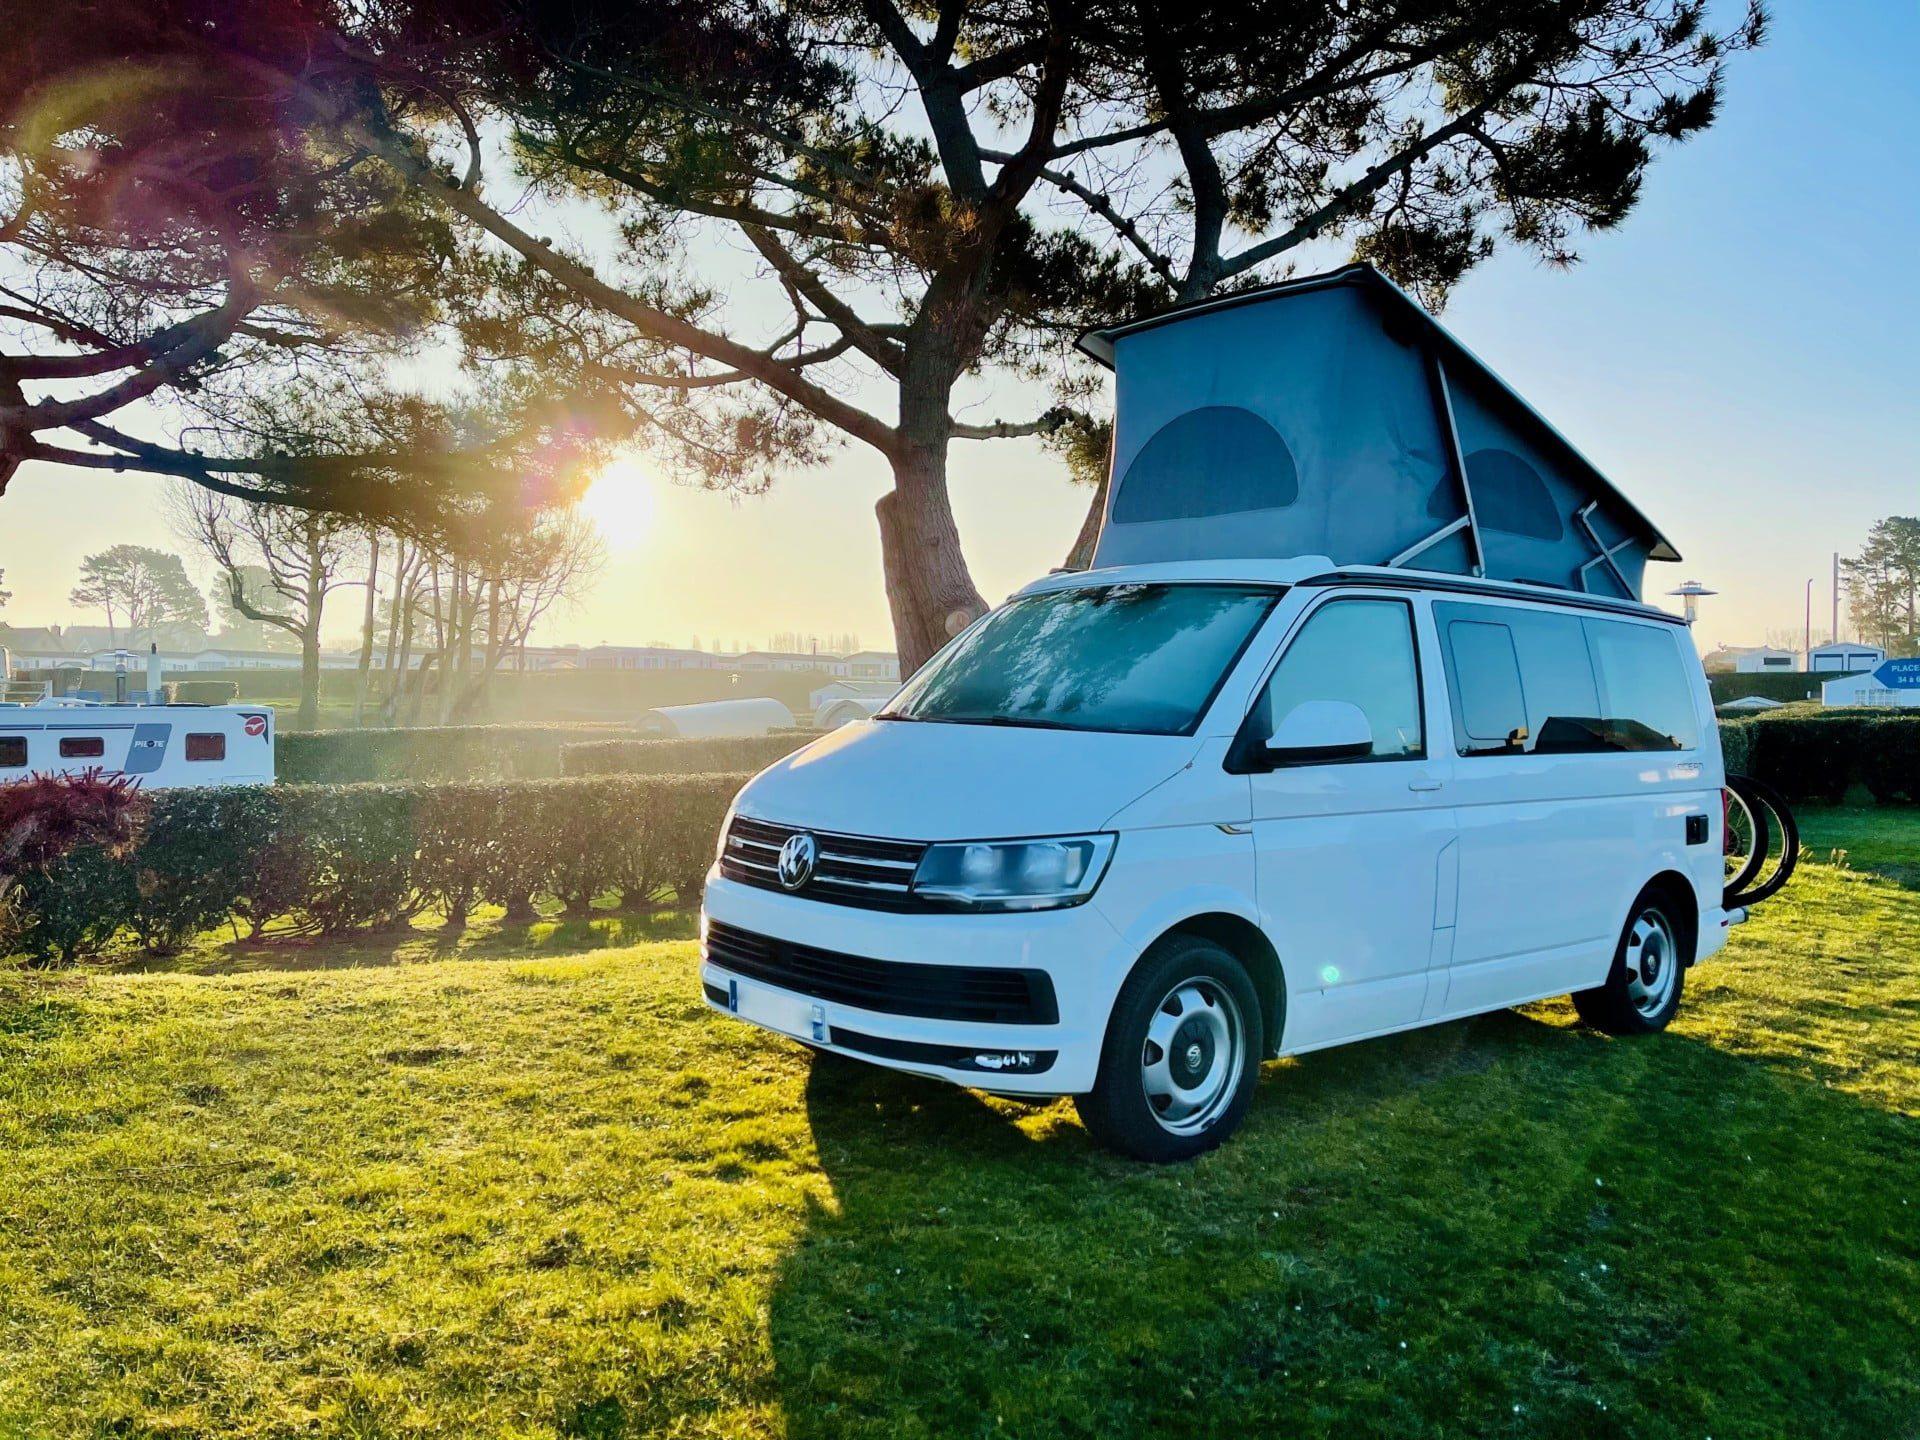 Camping-Car-Camping-Port-Blanc-DINARD-Bretagne-Mer-Plage-Vacances-Nature